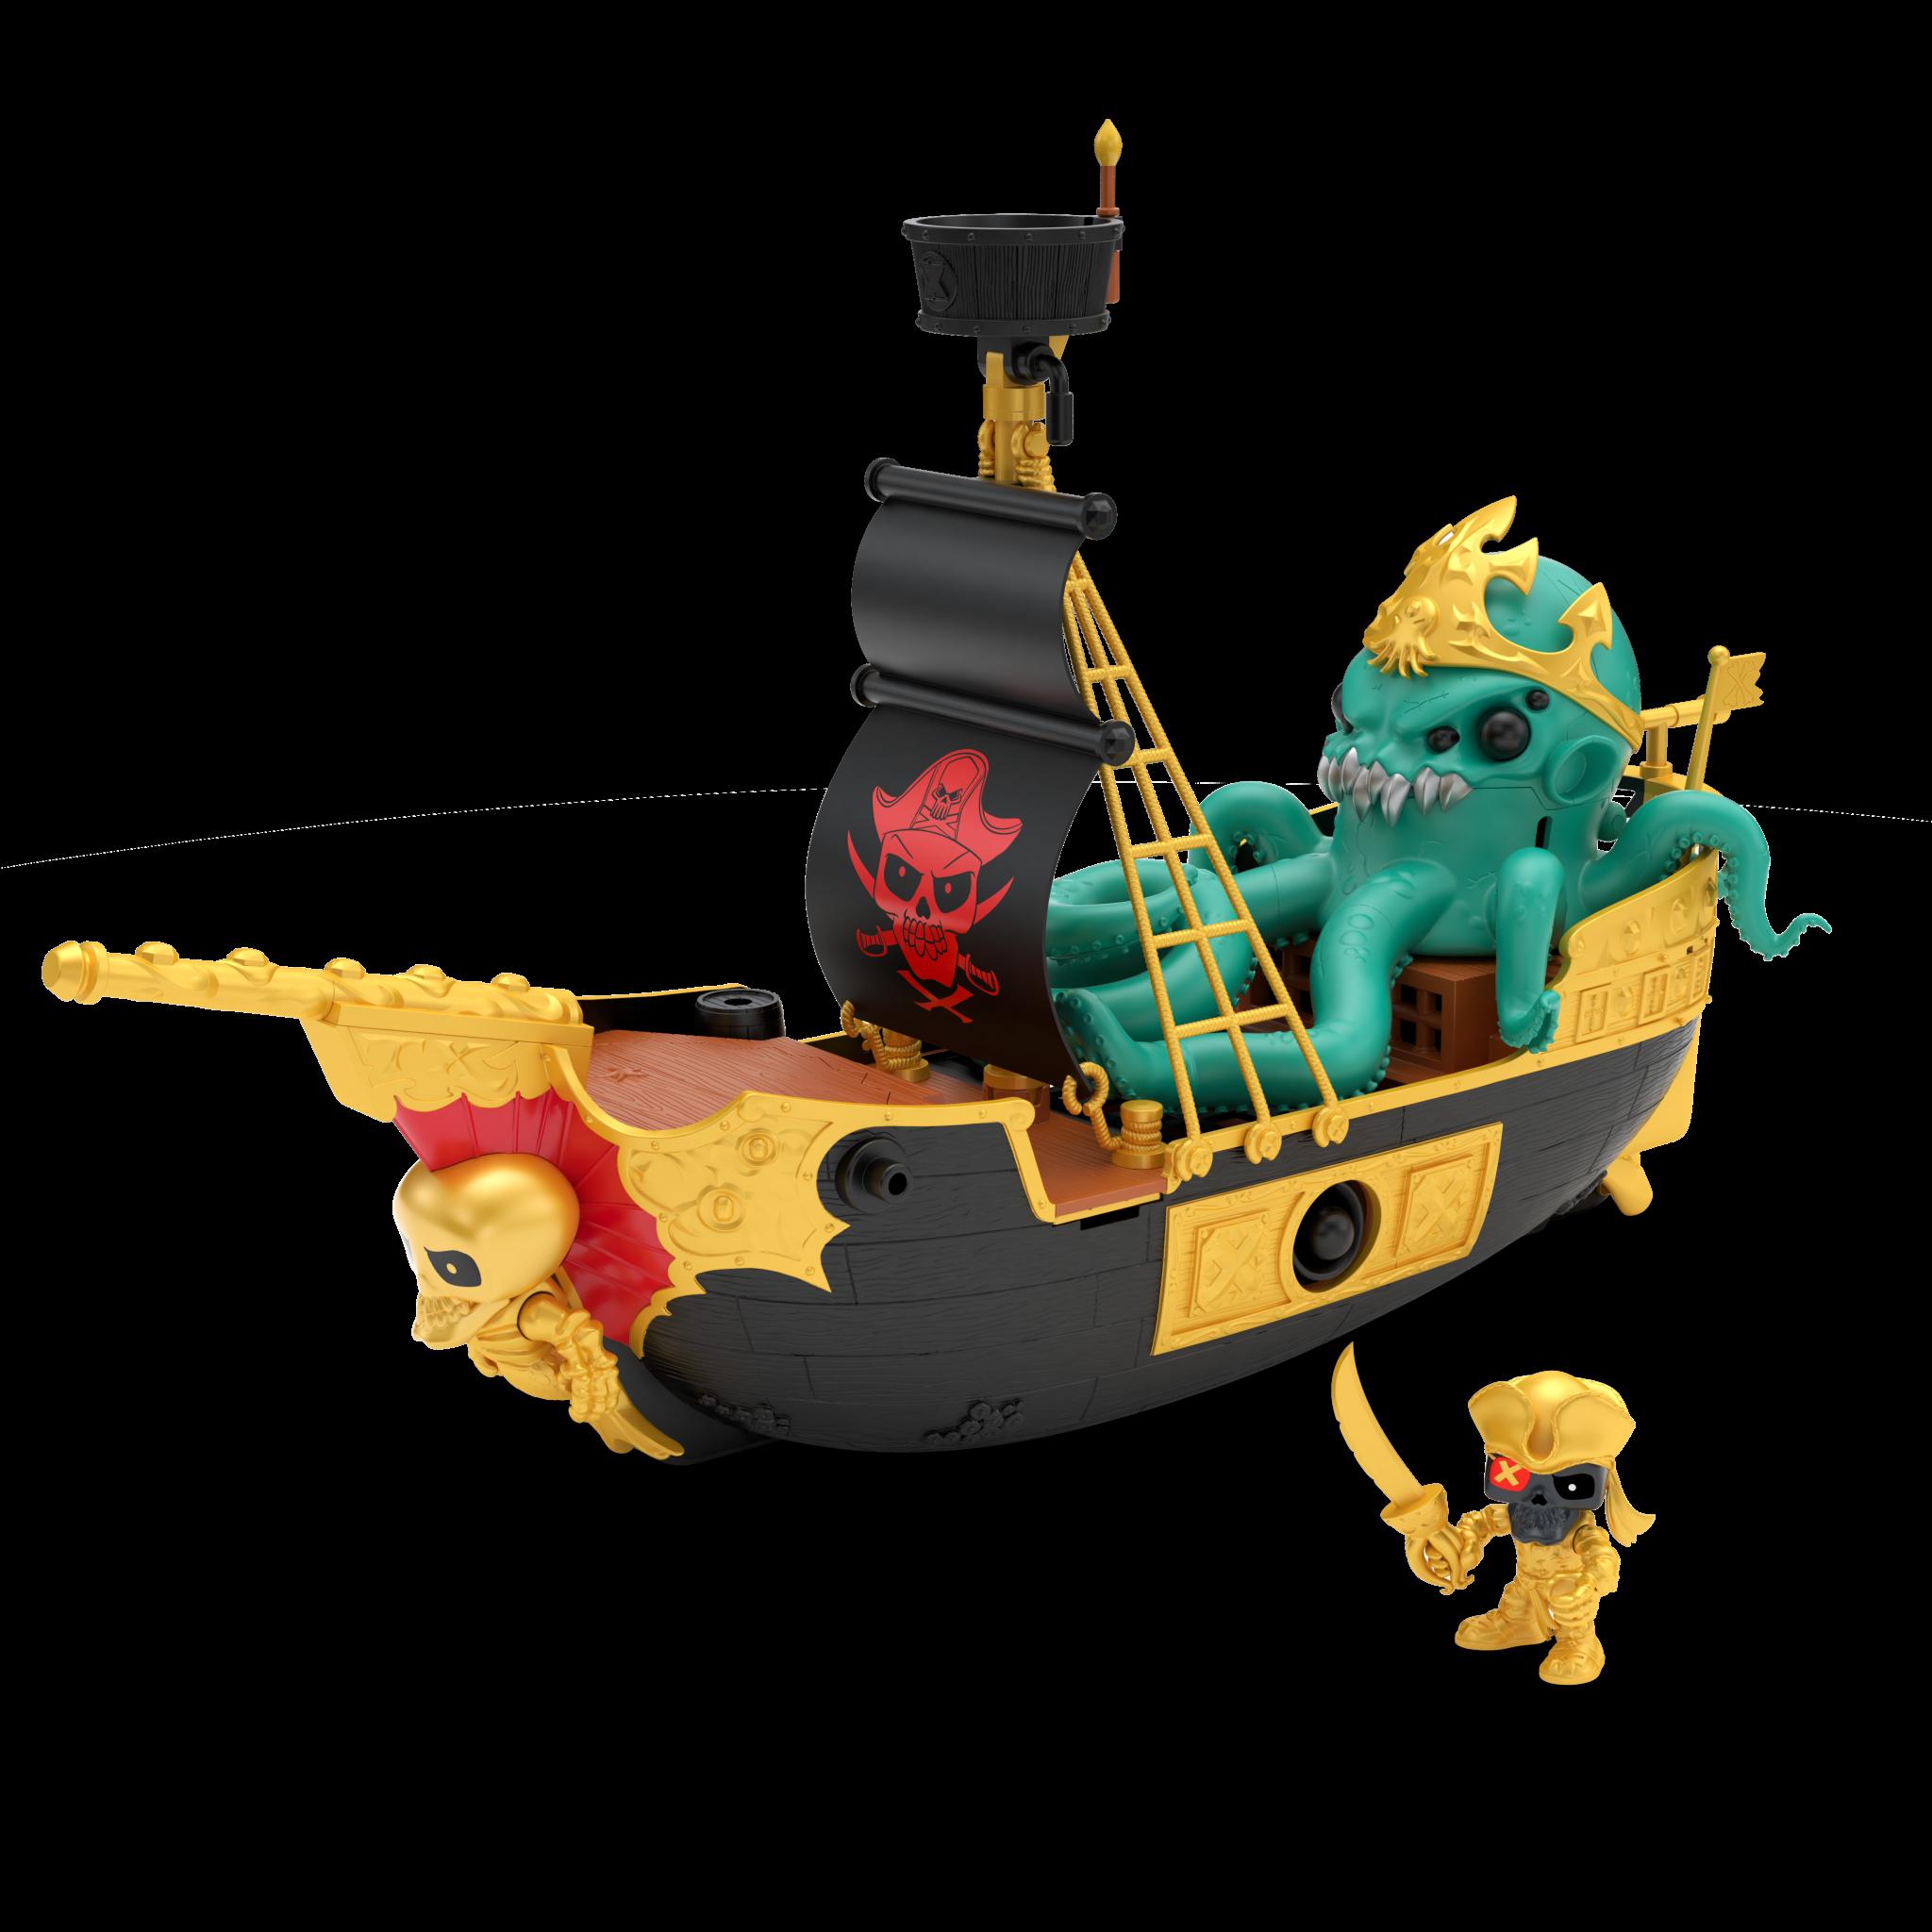 Treasure X - S5 Sunken Gold Shipwreck Playset (70-00703)